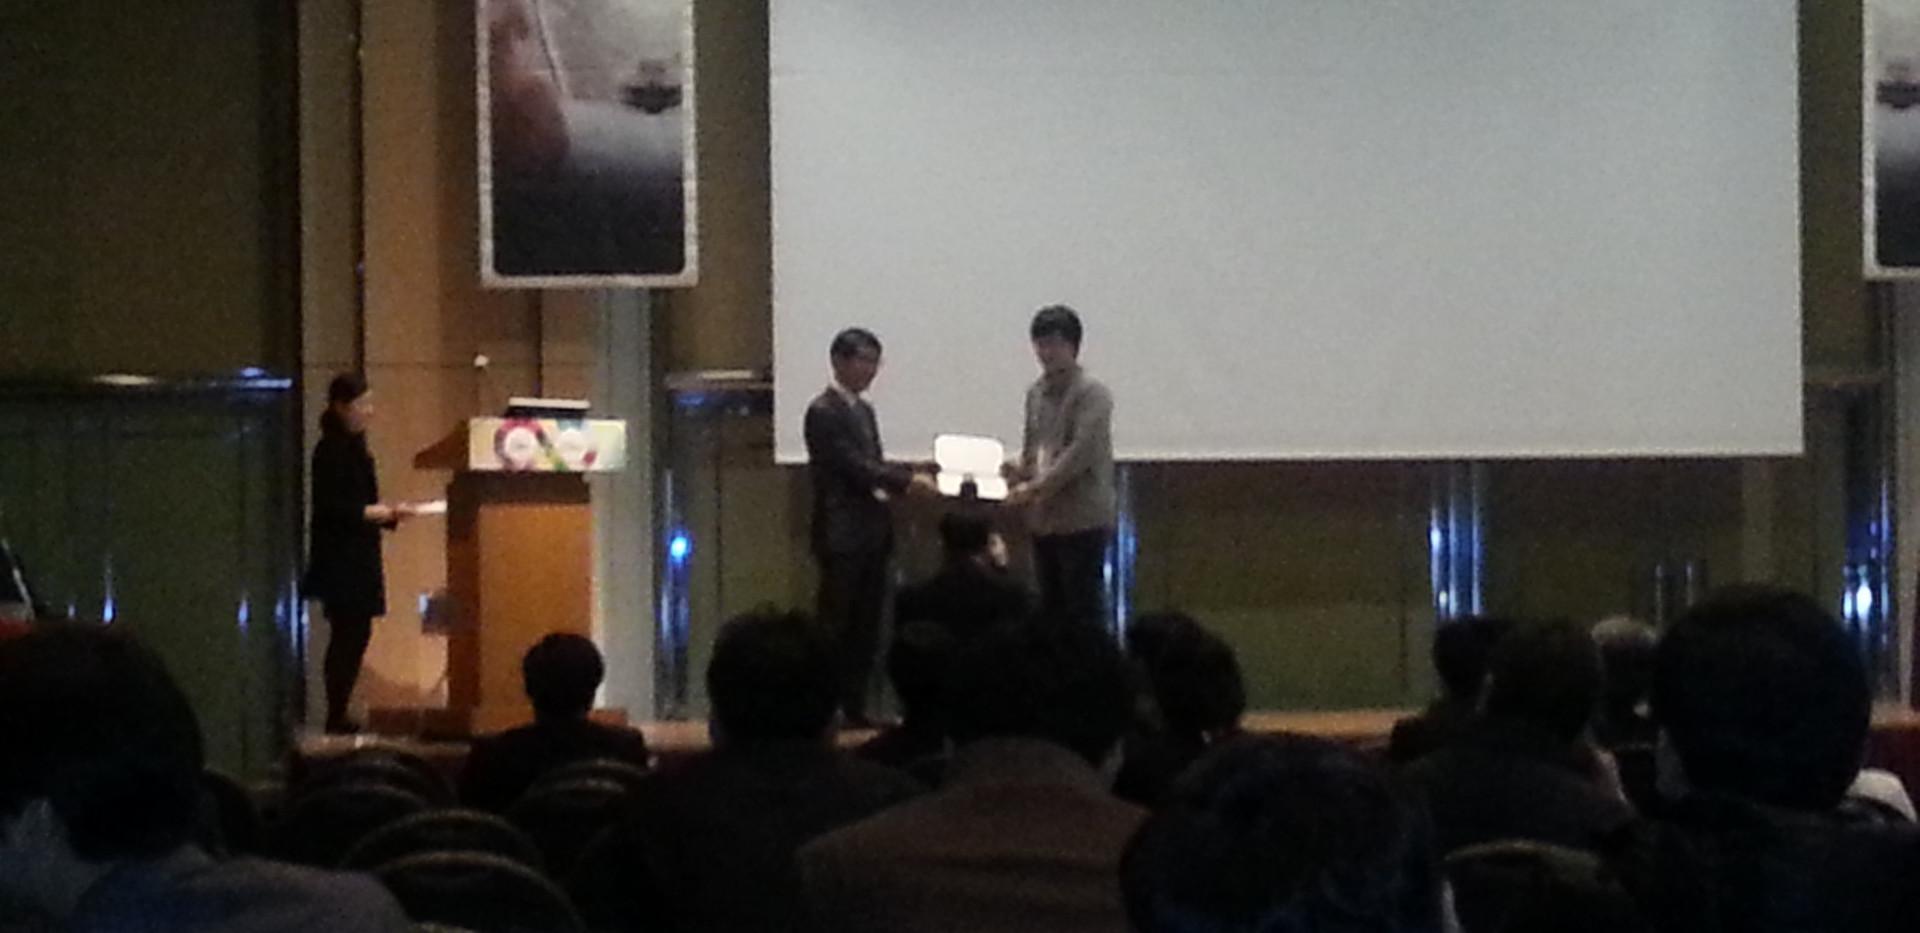 ICMRI2013_chanhee lee